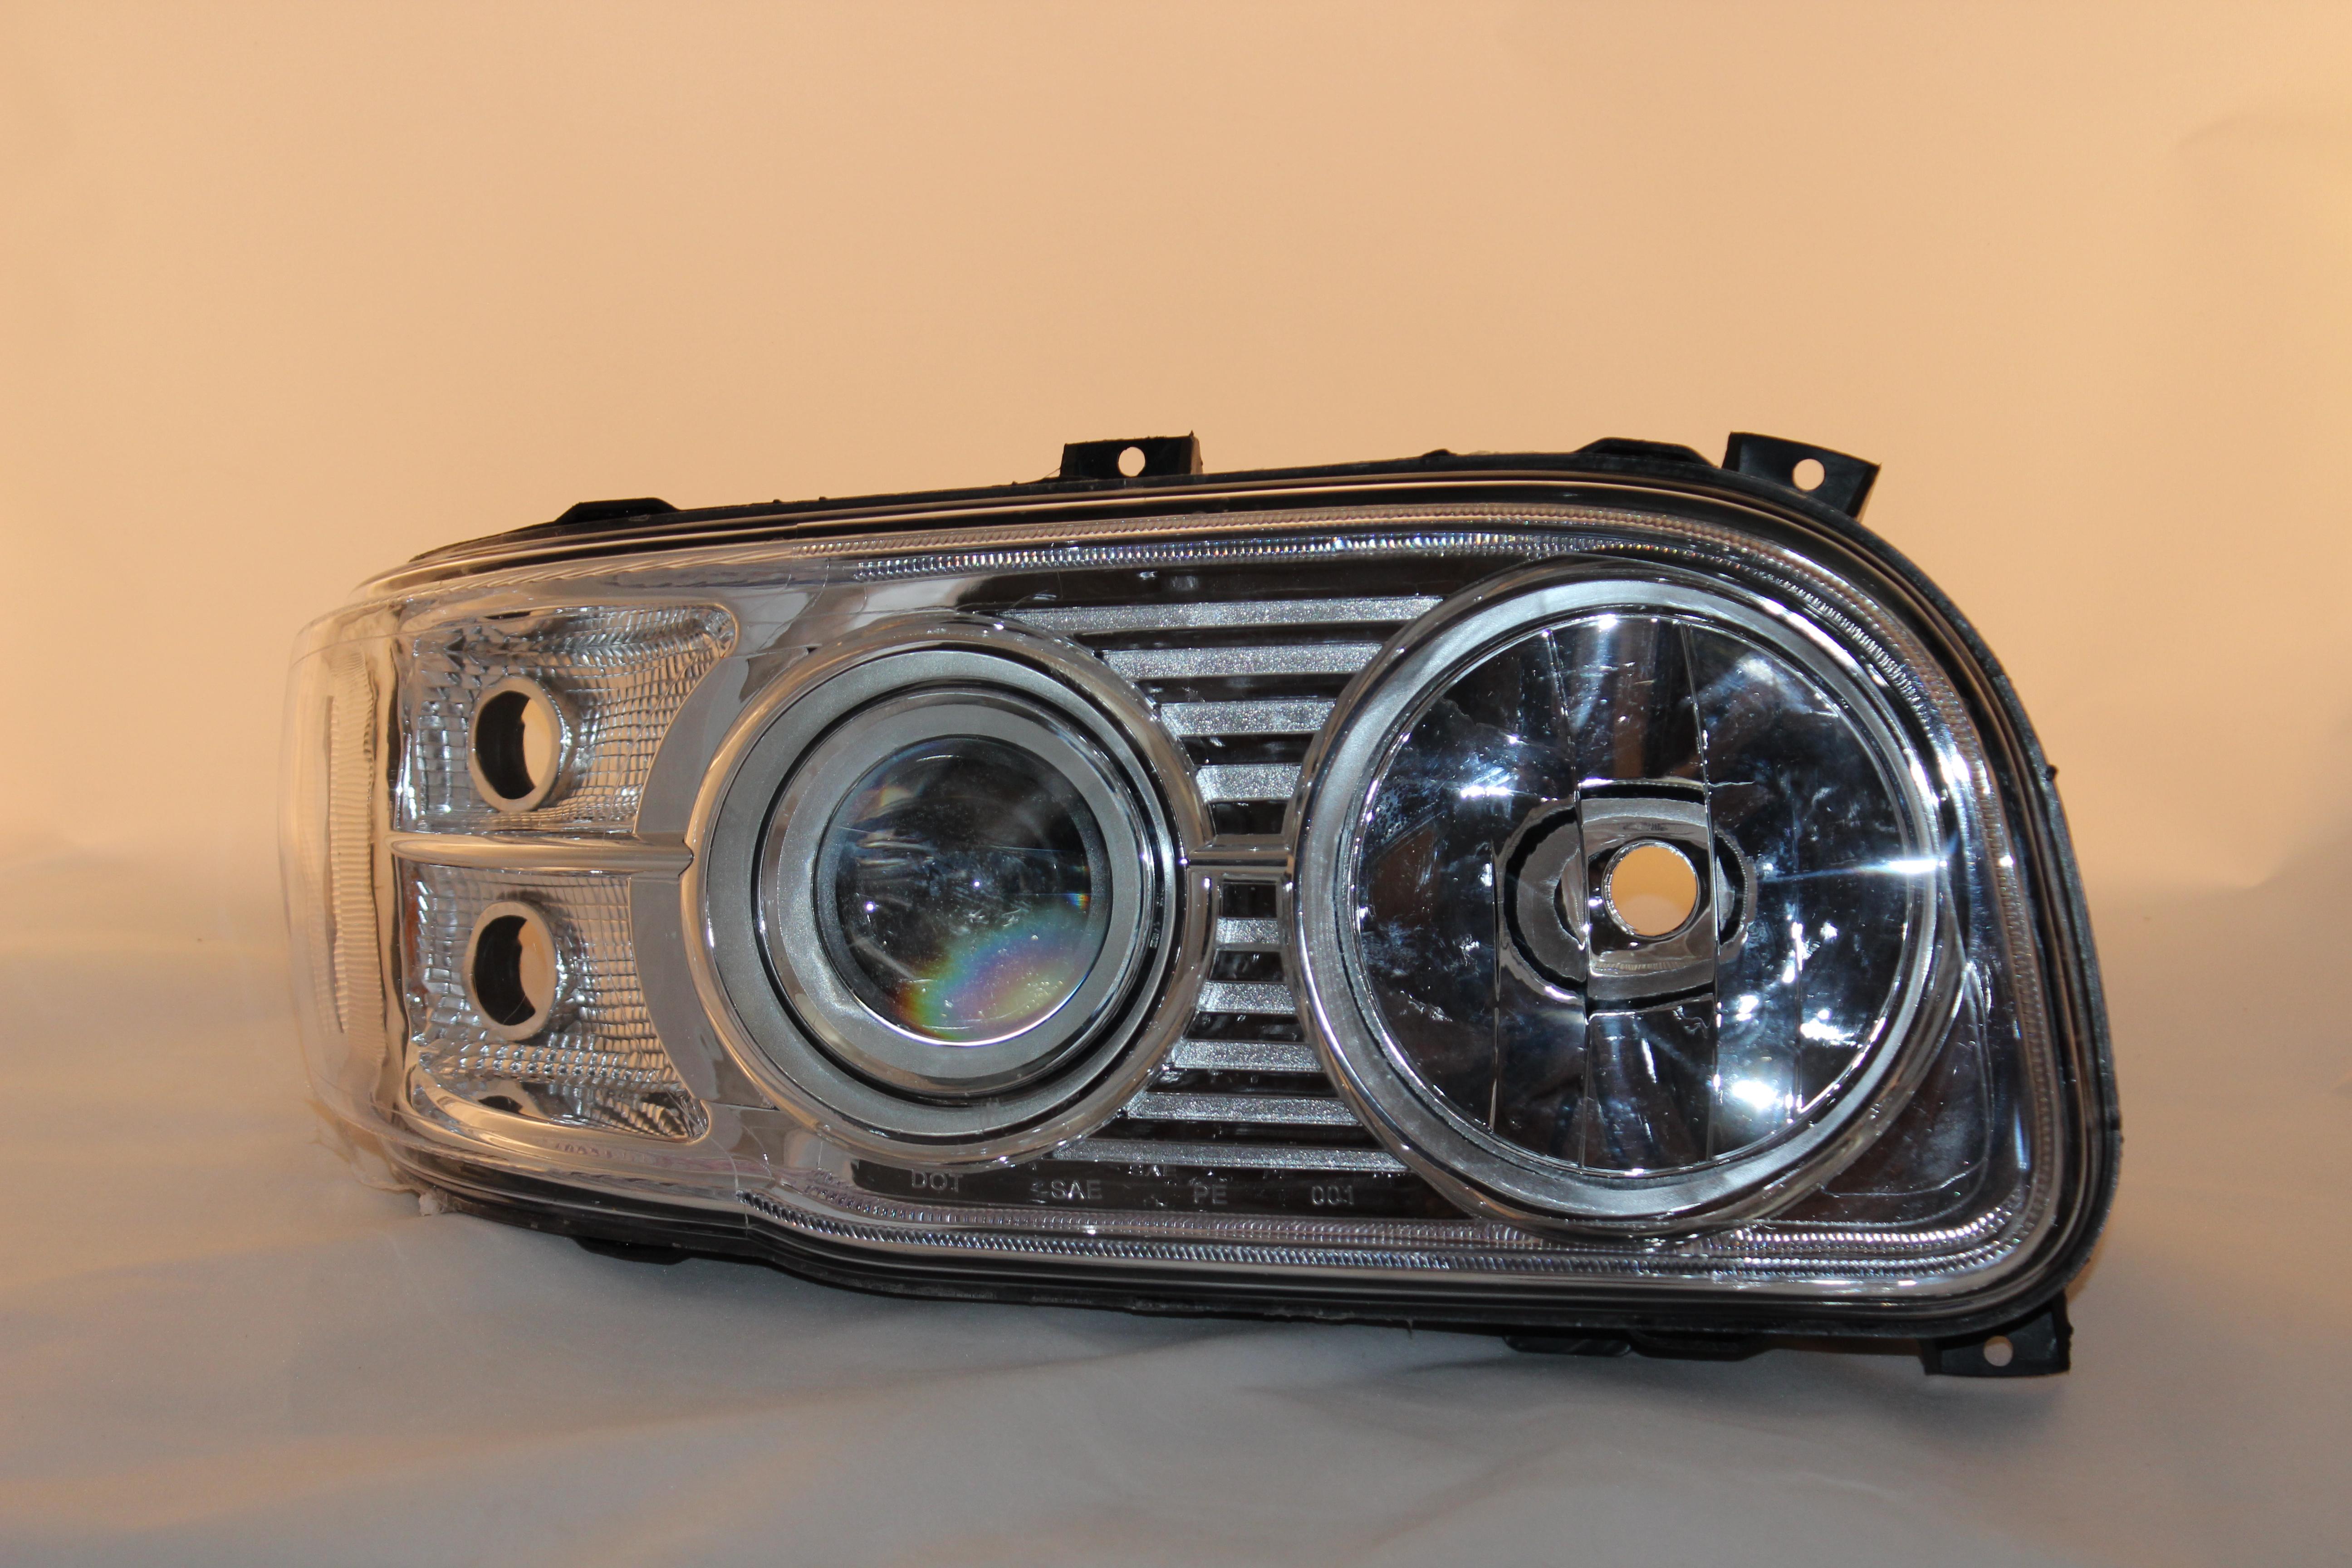 Peterbilt 388/389/567 Bi-Xenon Projector Headlight Upgrade